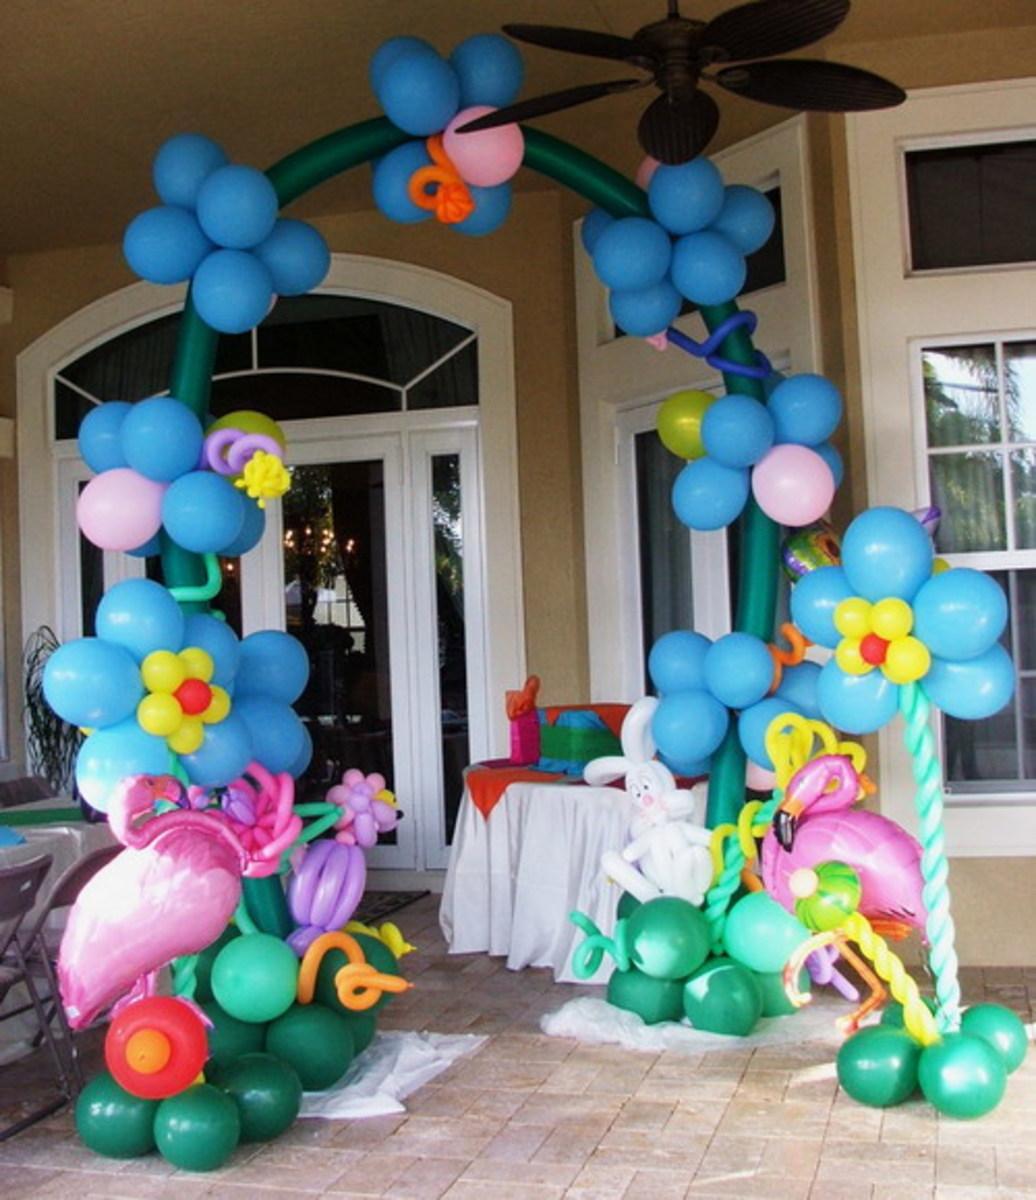 Wonderland balloon arch from http://www.balloons.dreamark.net/kids.html